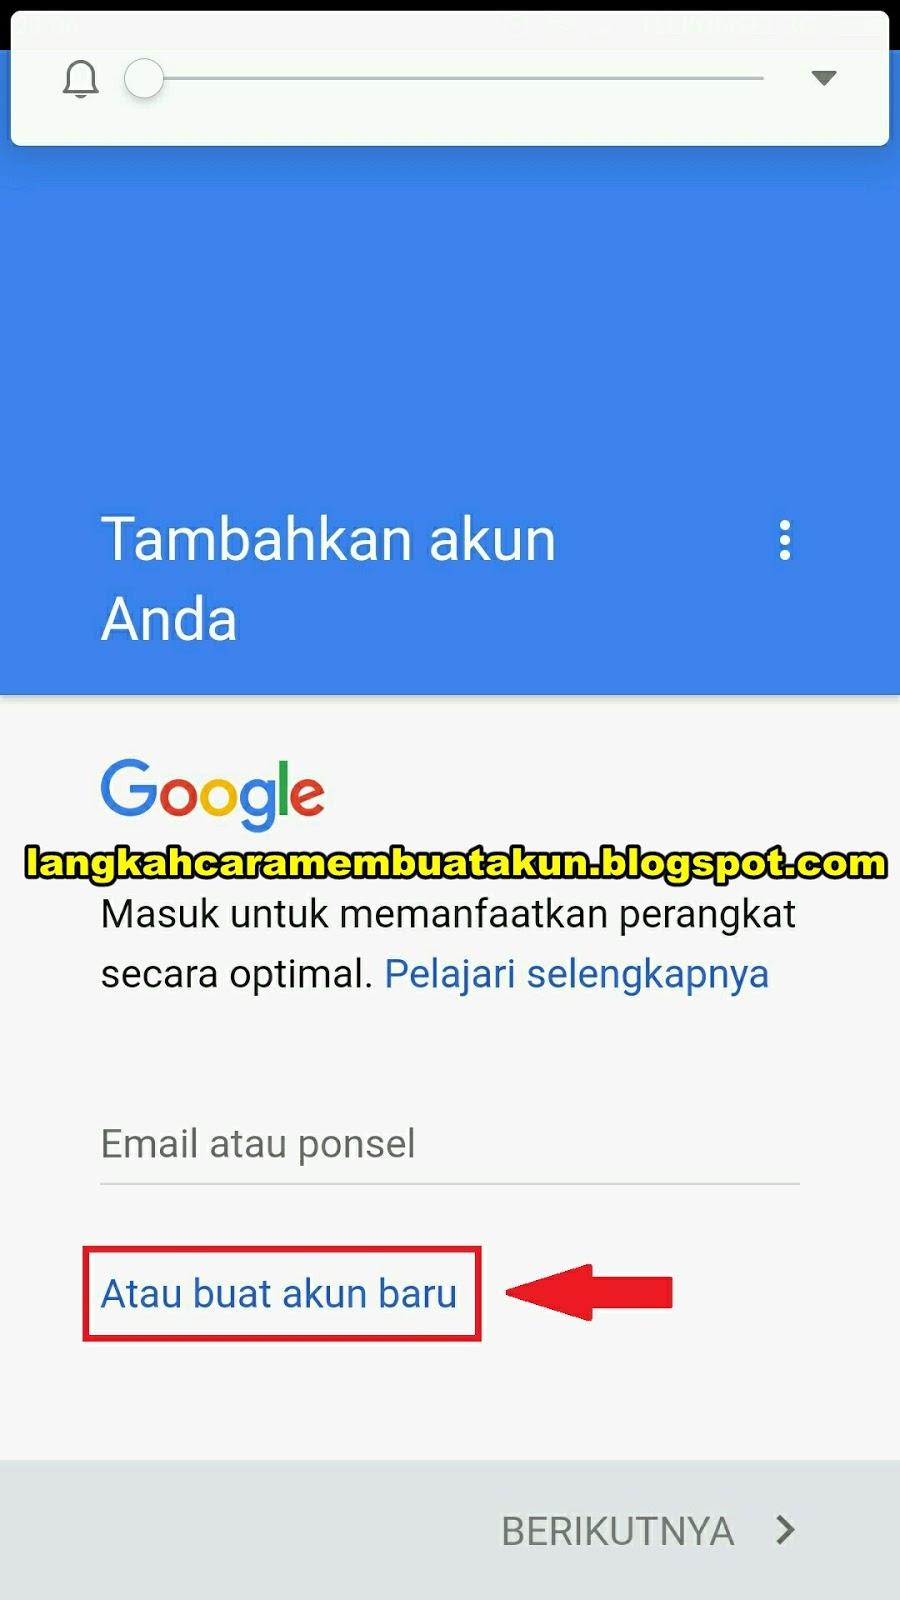 Daftar Email Gmail Indonesia Gratis Lewat Hp Android